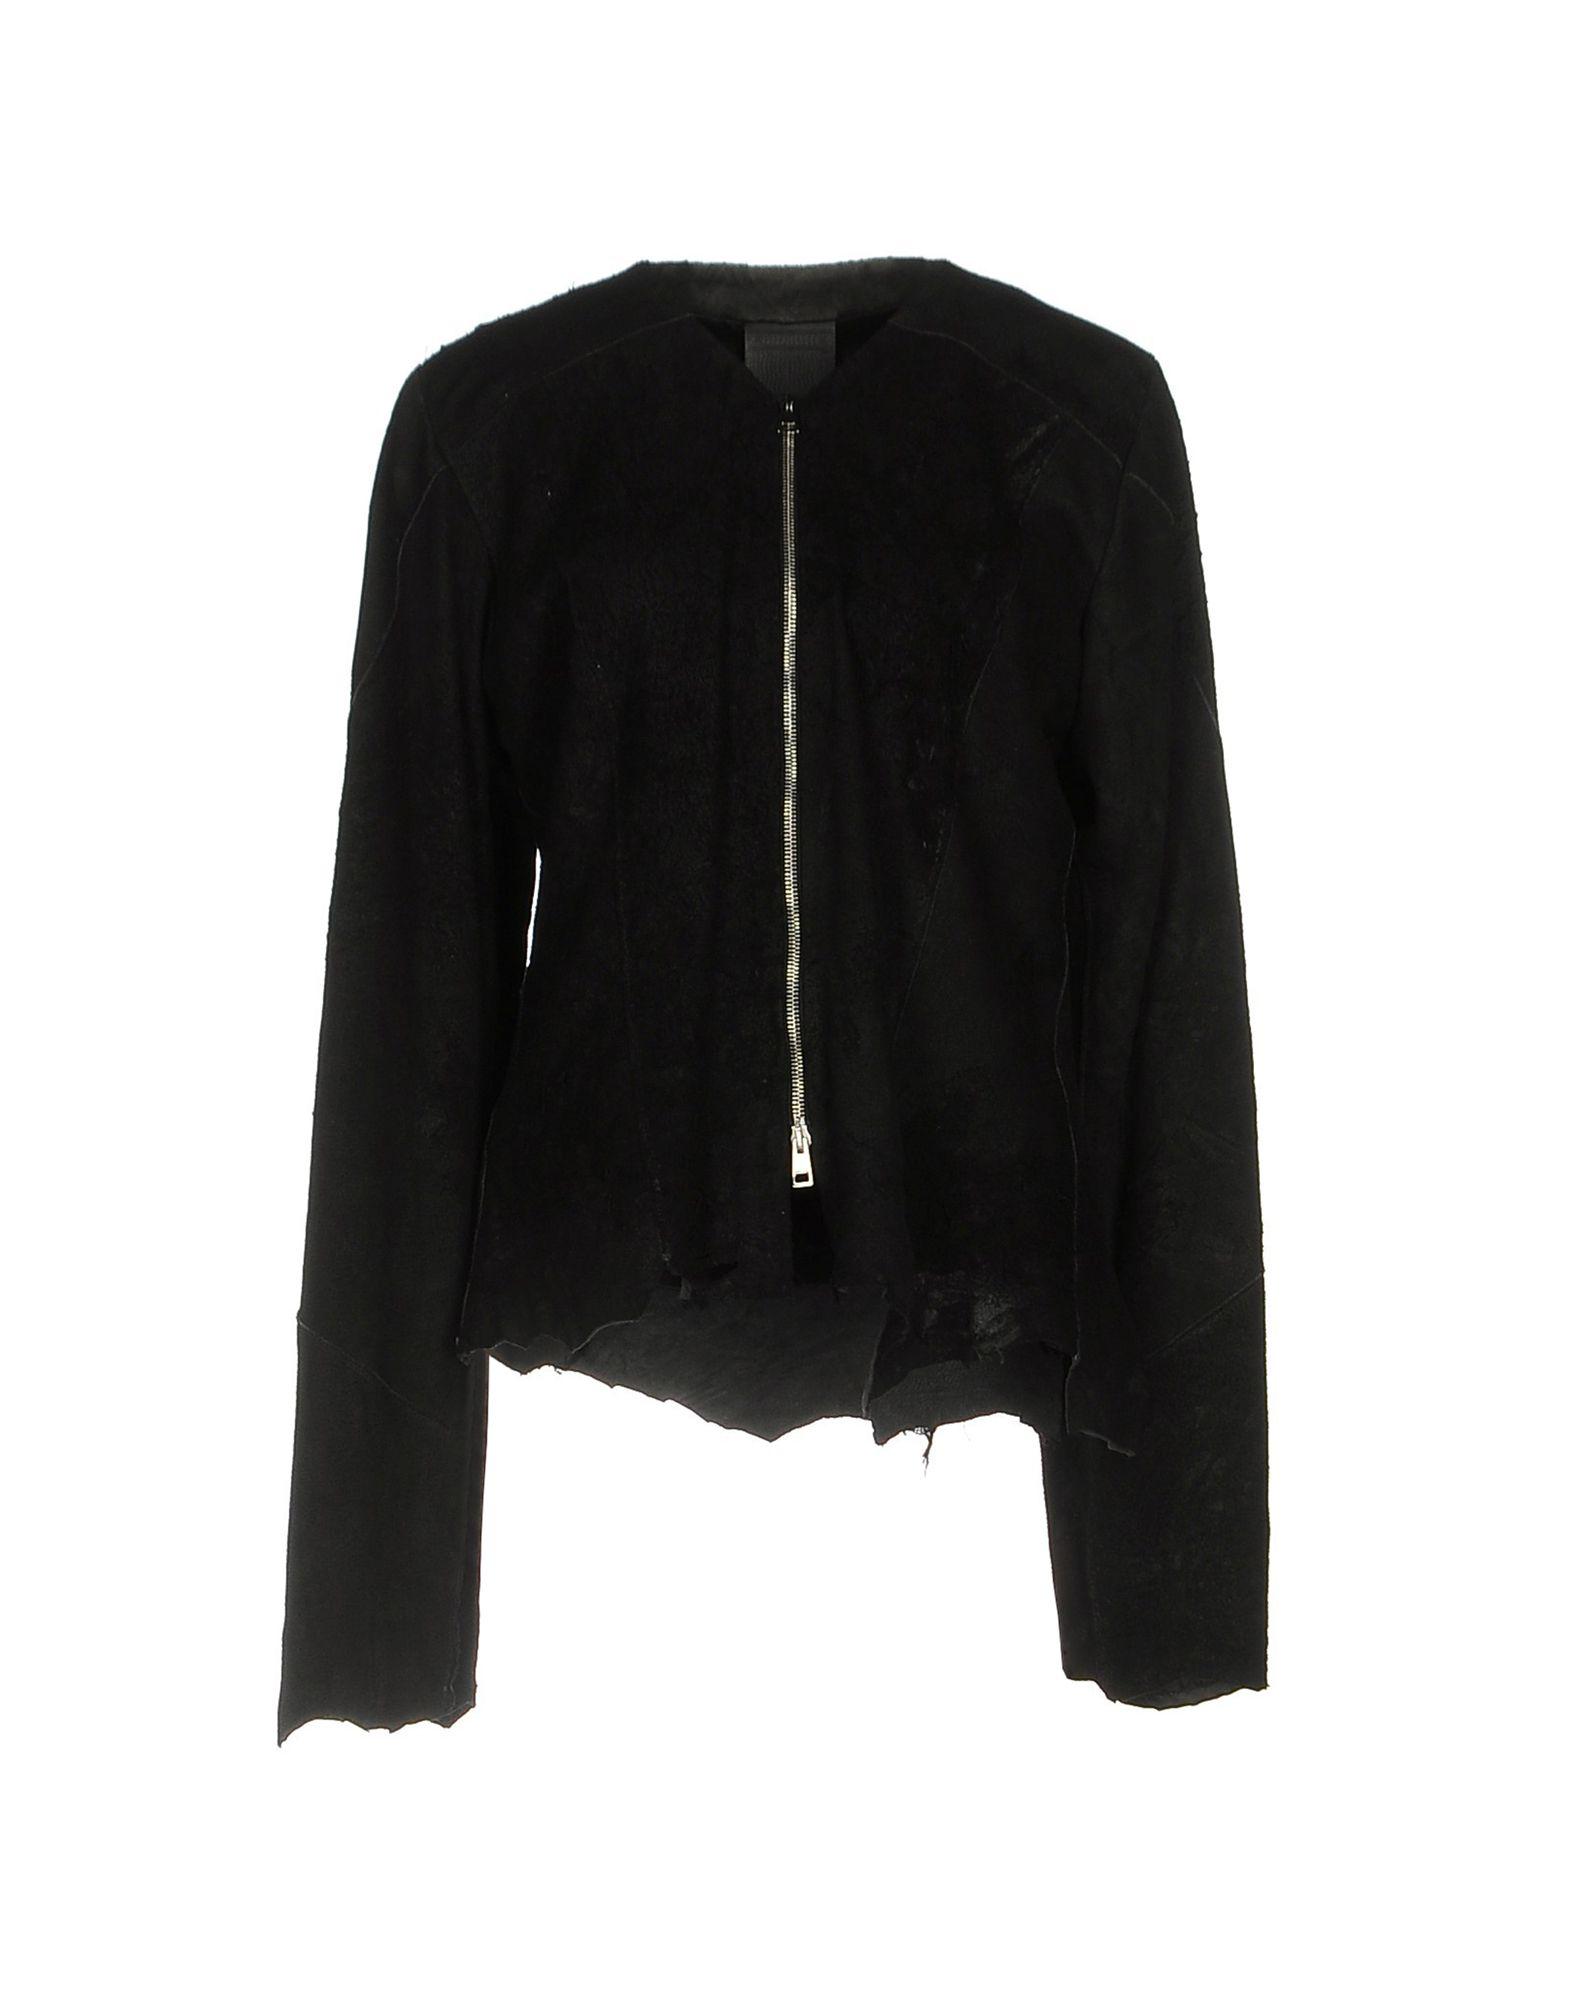 GIOCASTA Jackets in Black